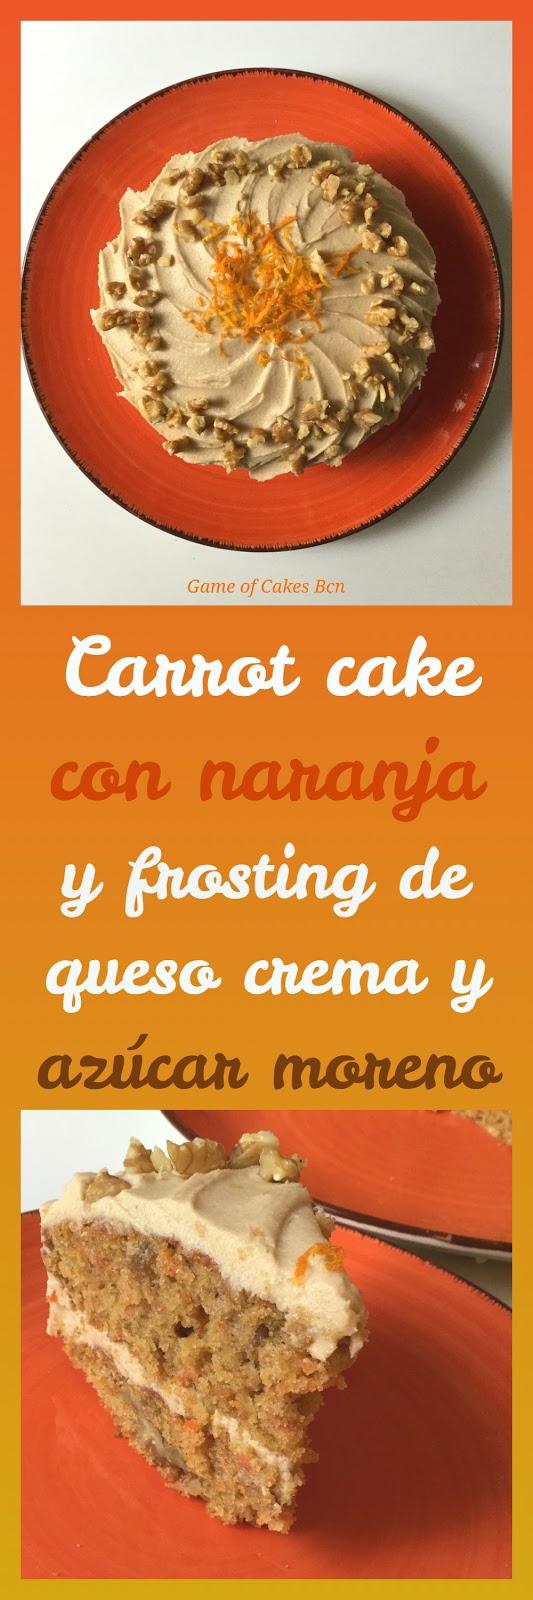 Carrot cake con naranja y cobertura de azucar moreno. Game of Cakes Bcn